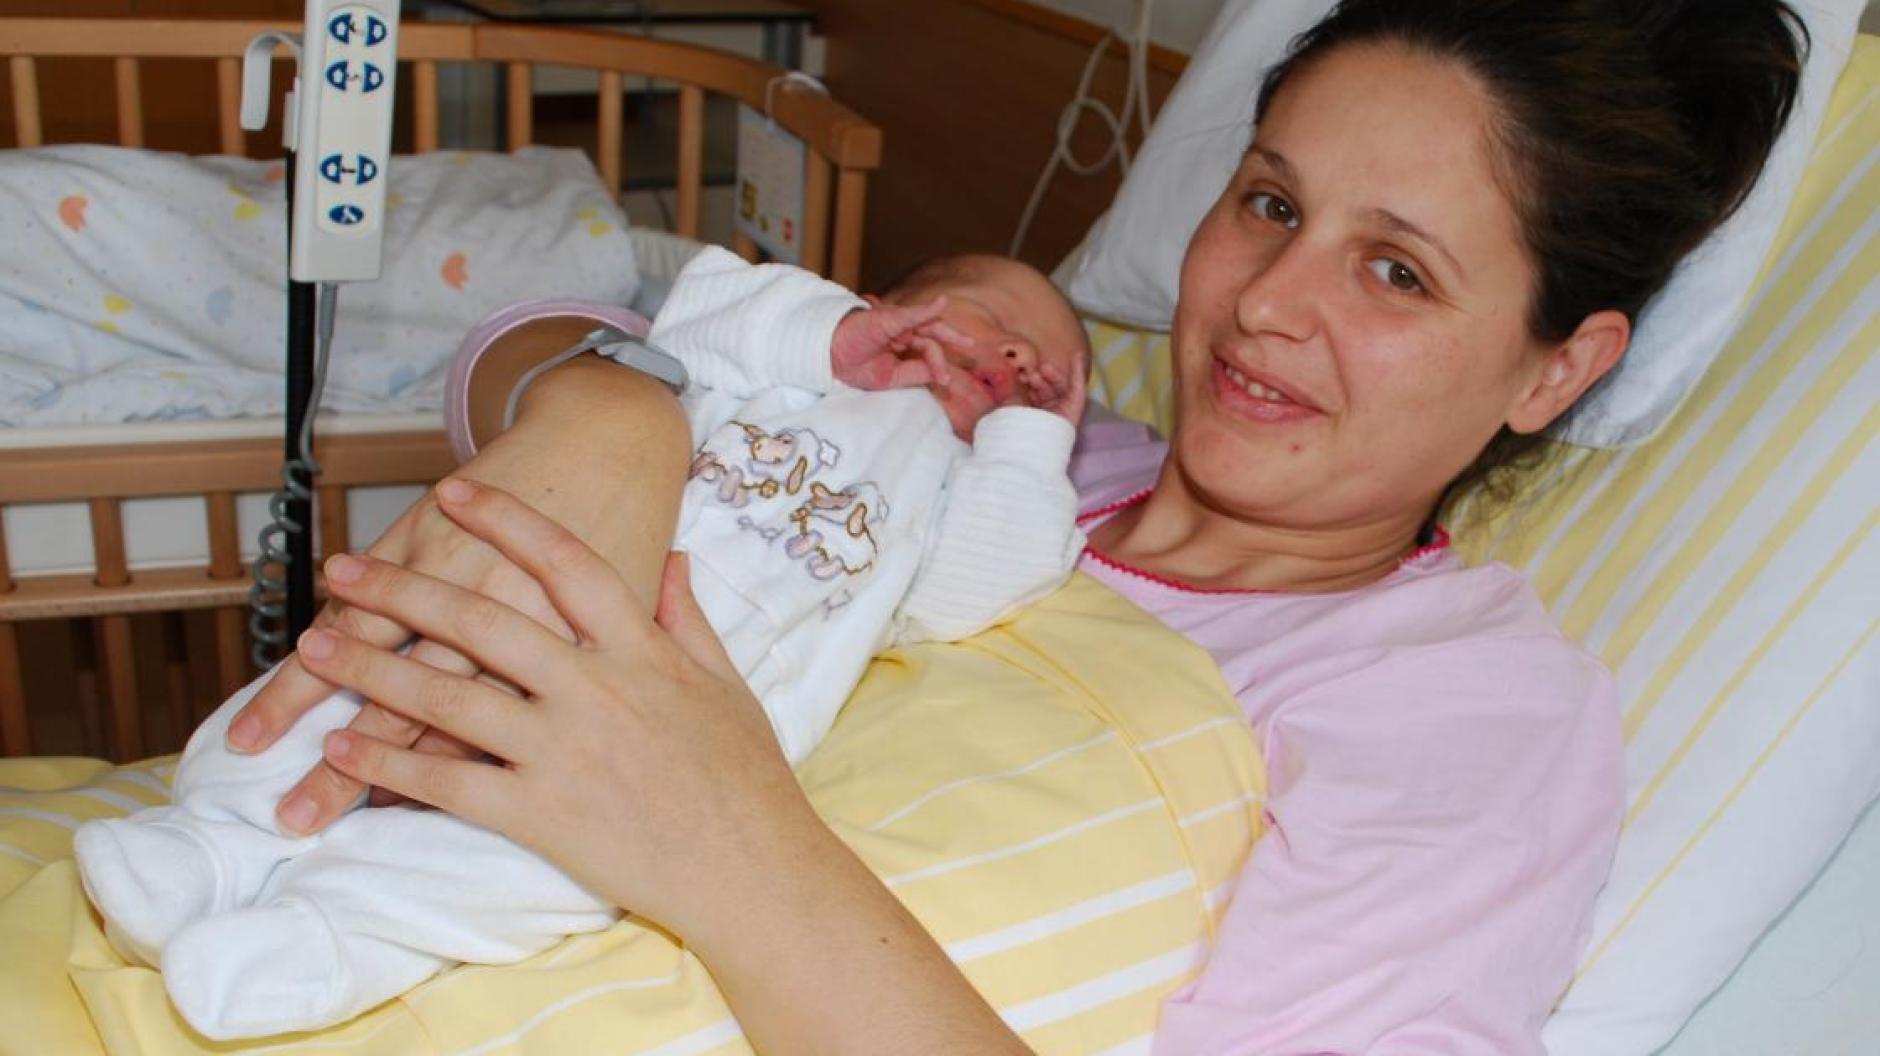 Geburt: Dieses Baby feiert das Krankenhaus besonders